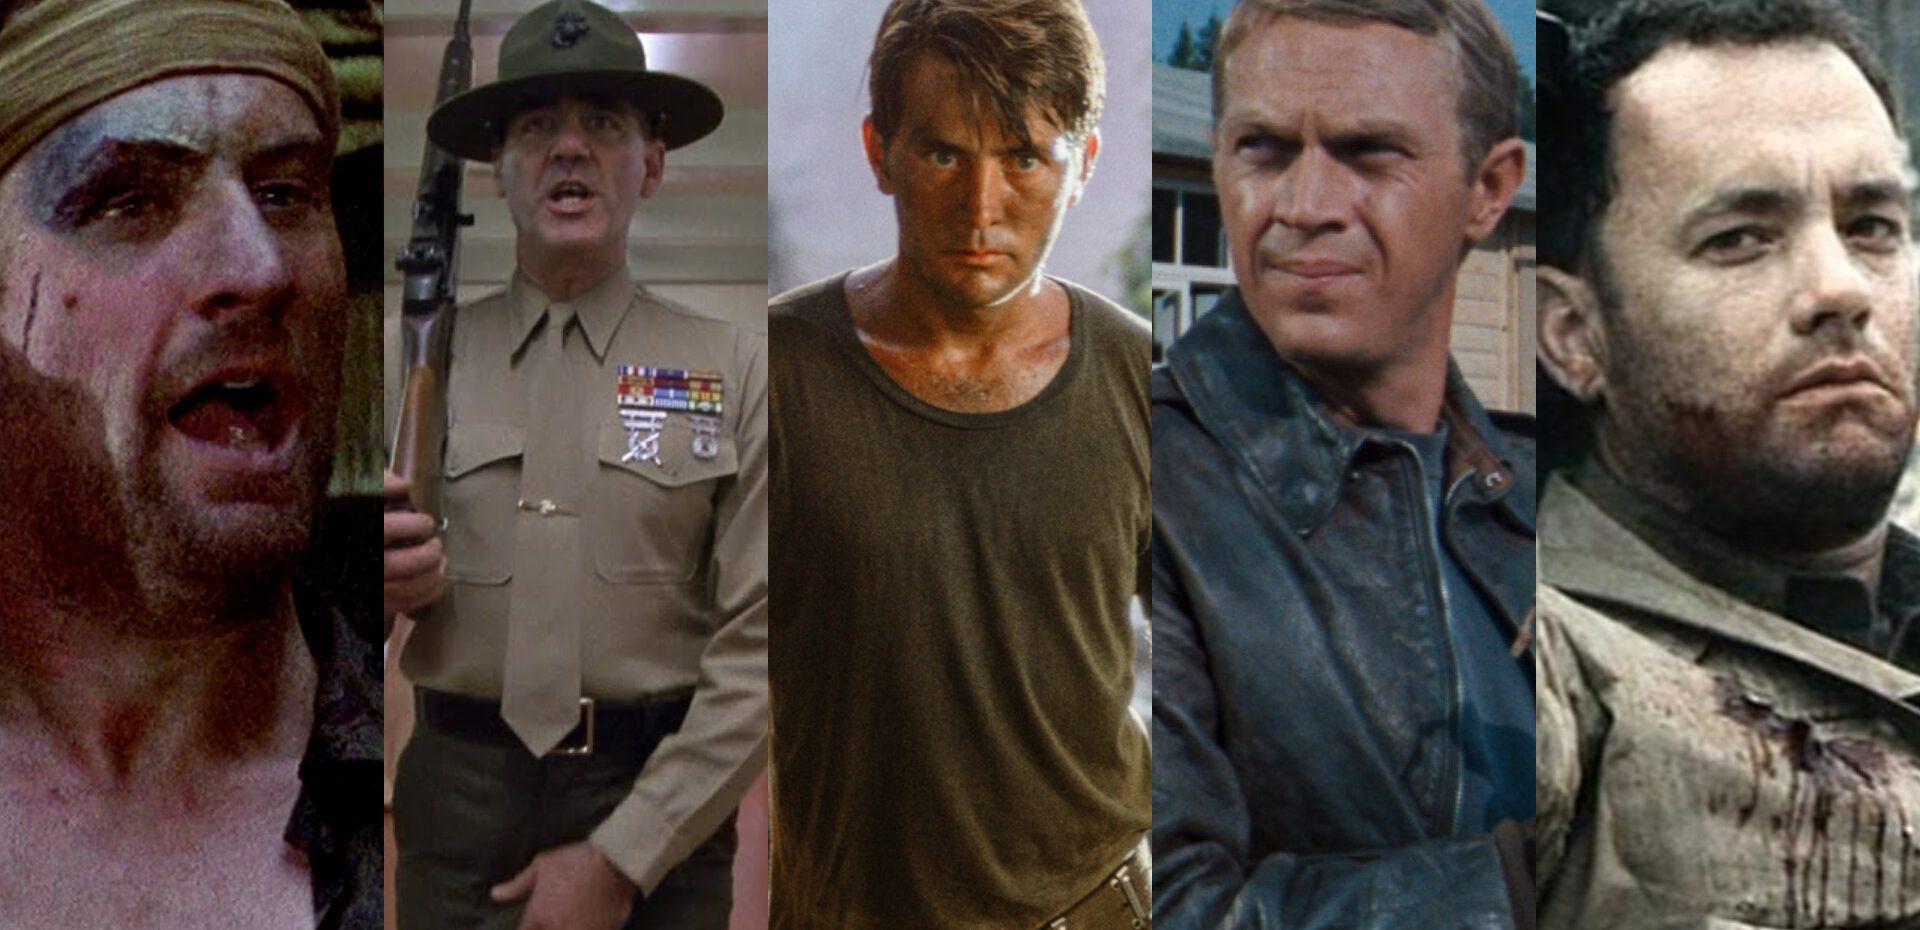 10 فیلم برتر جنگی جهان